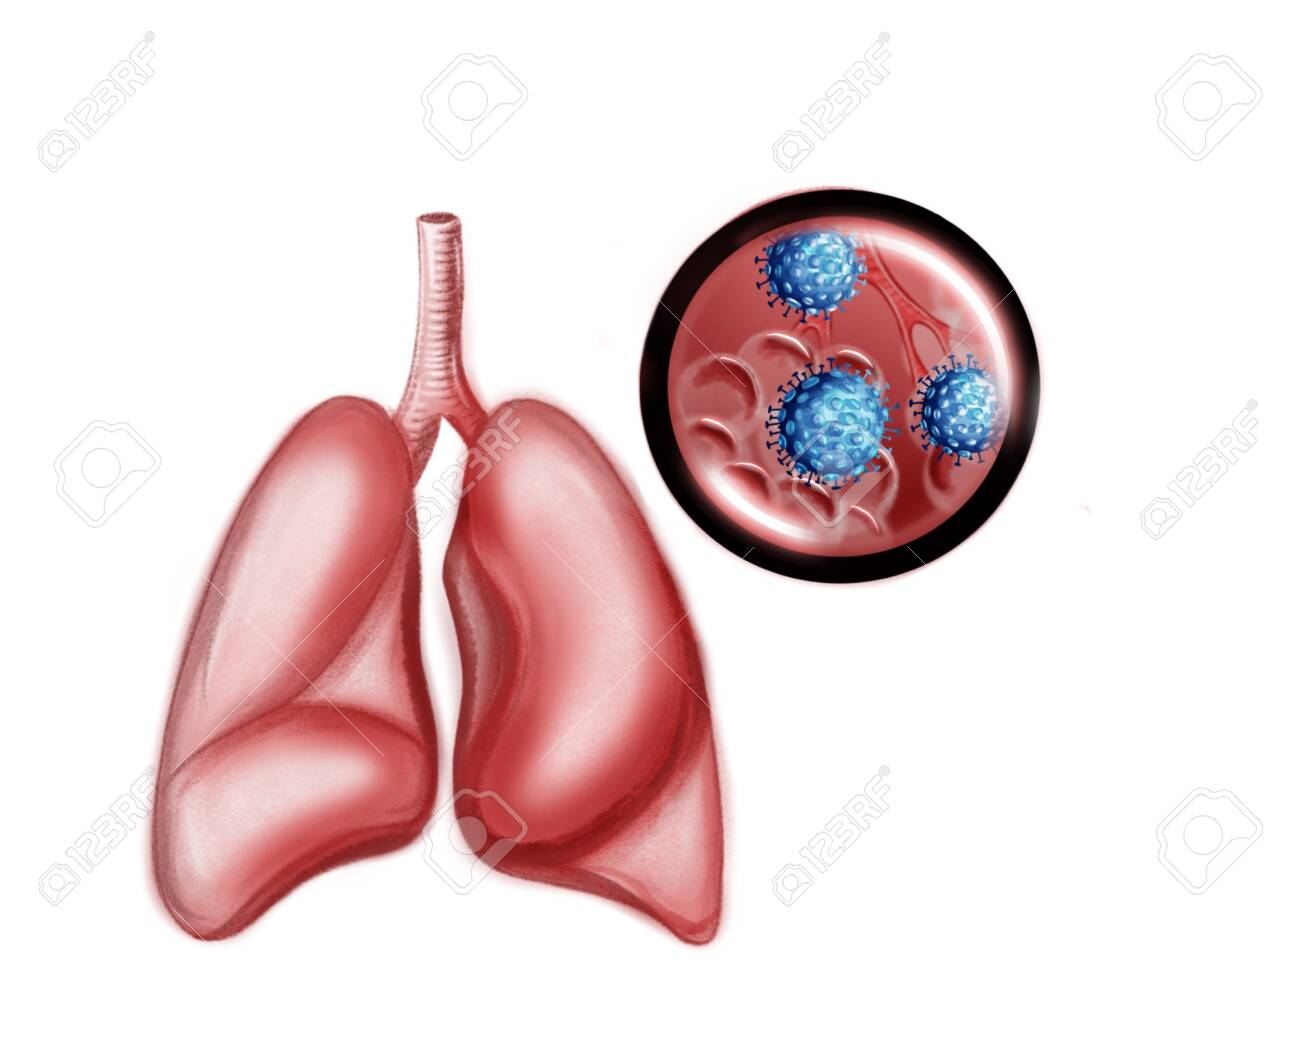 Illustration of the human lungs and coronavirus - 140310112